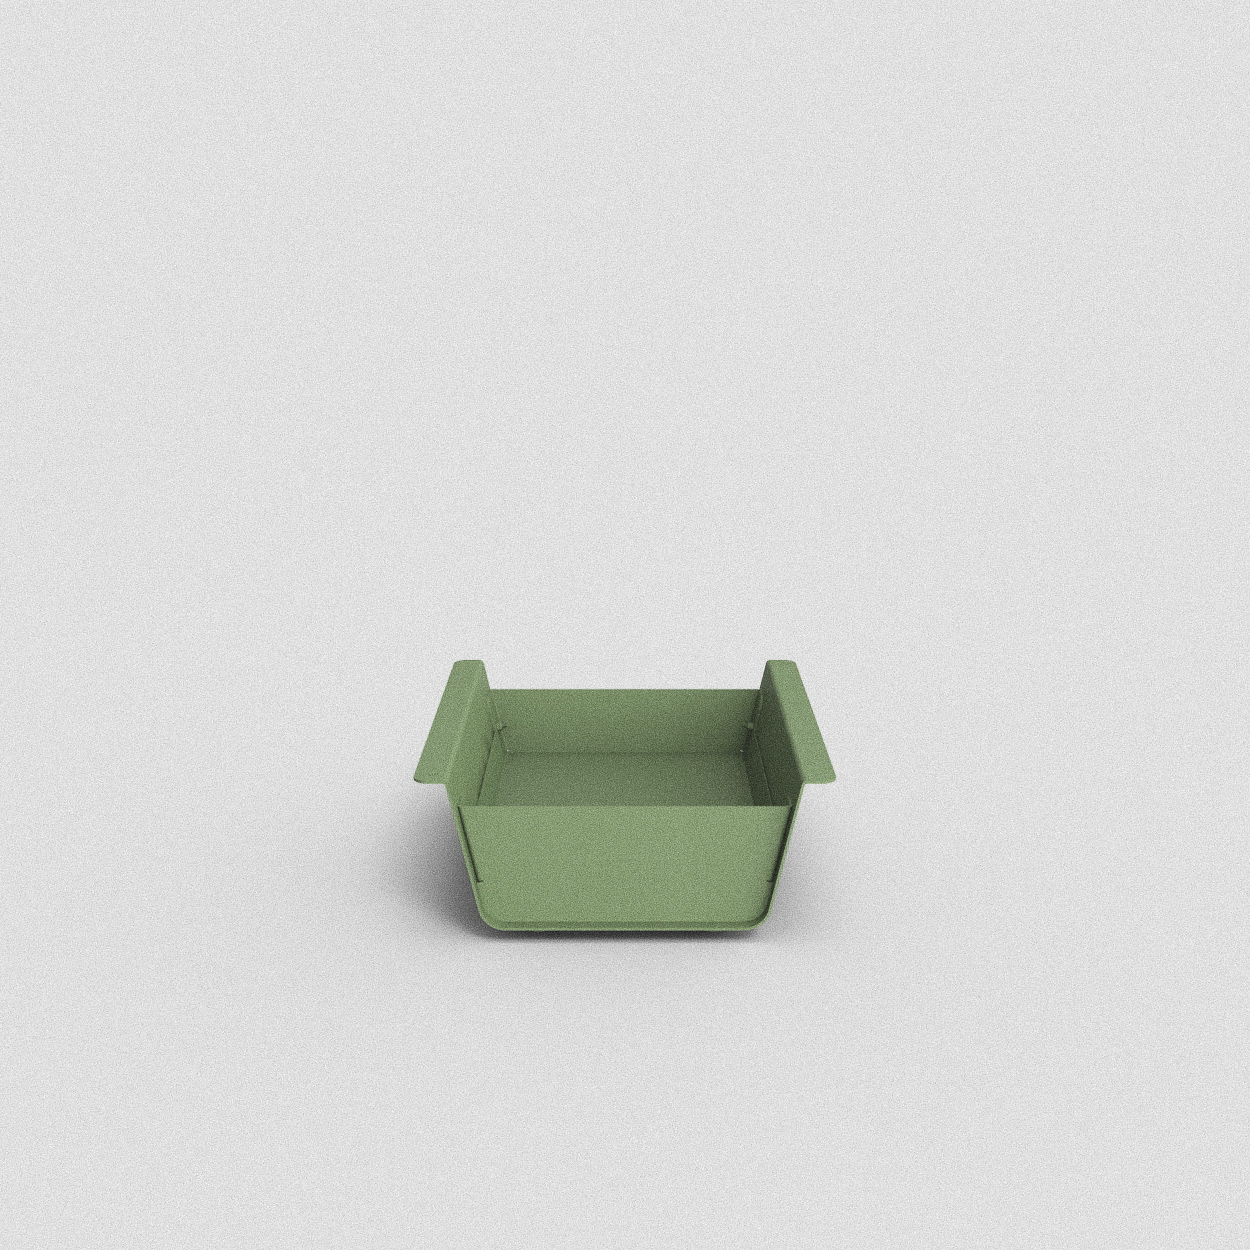 26L / Standardfärg: Mossa